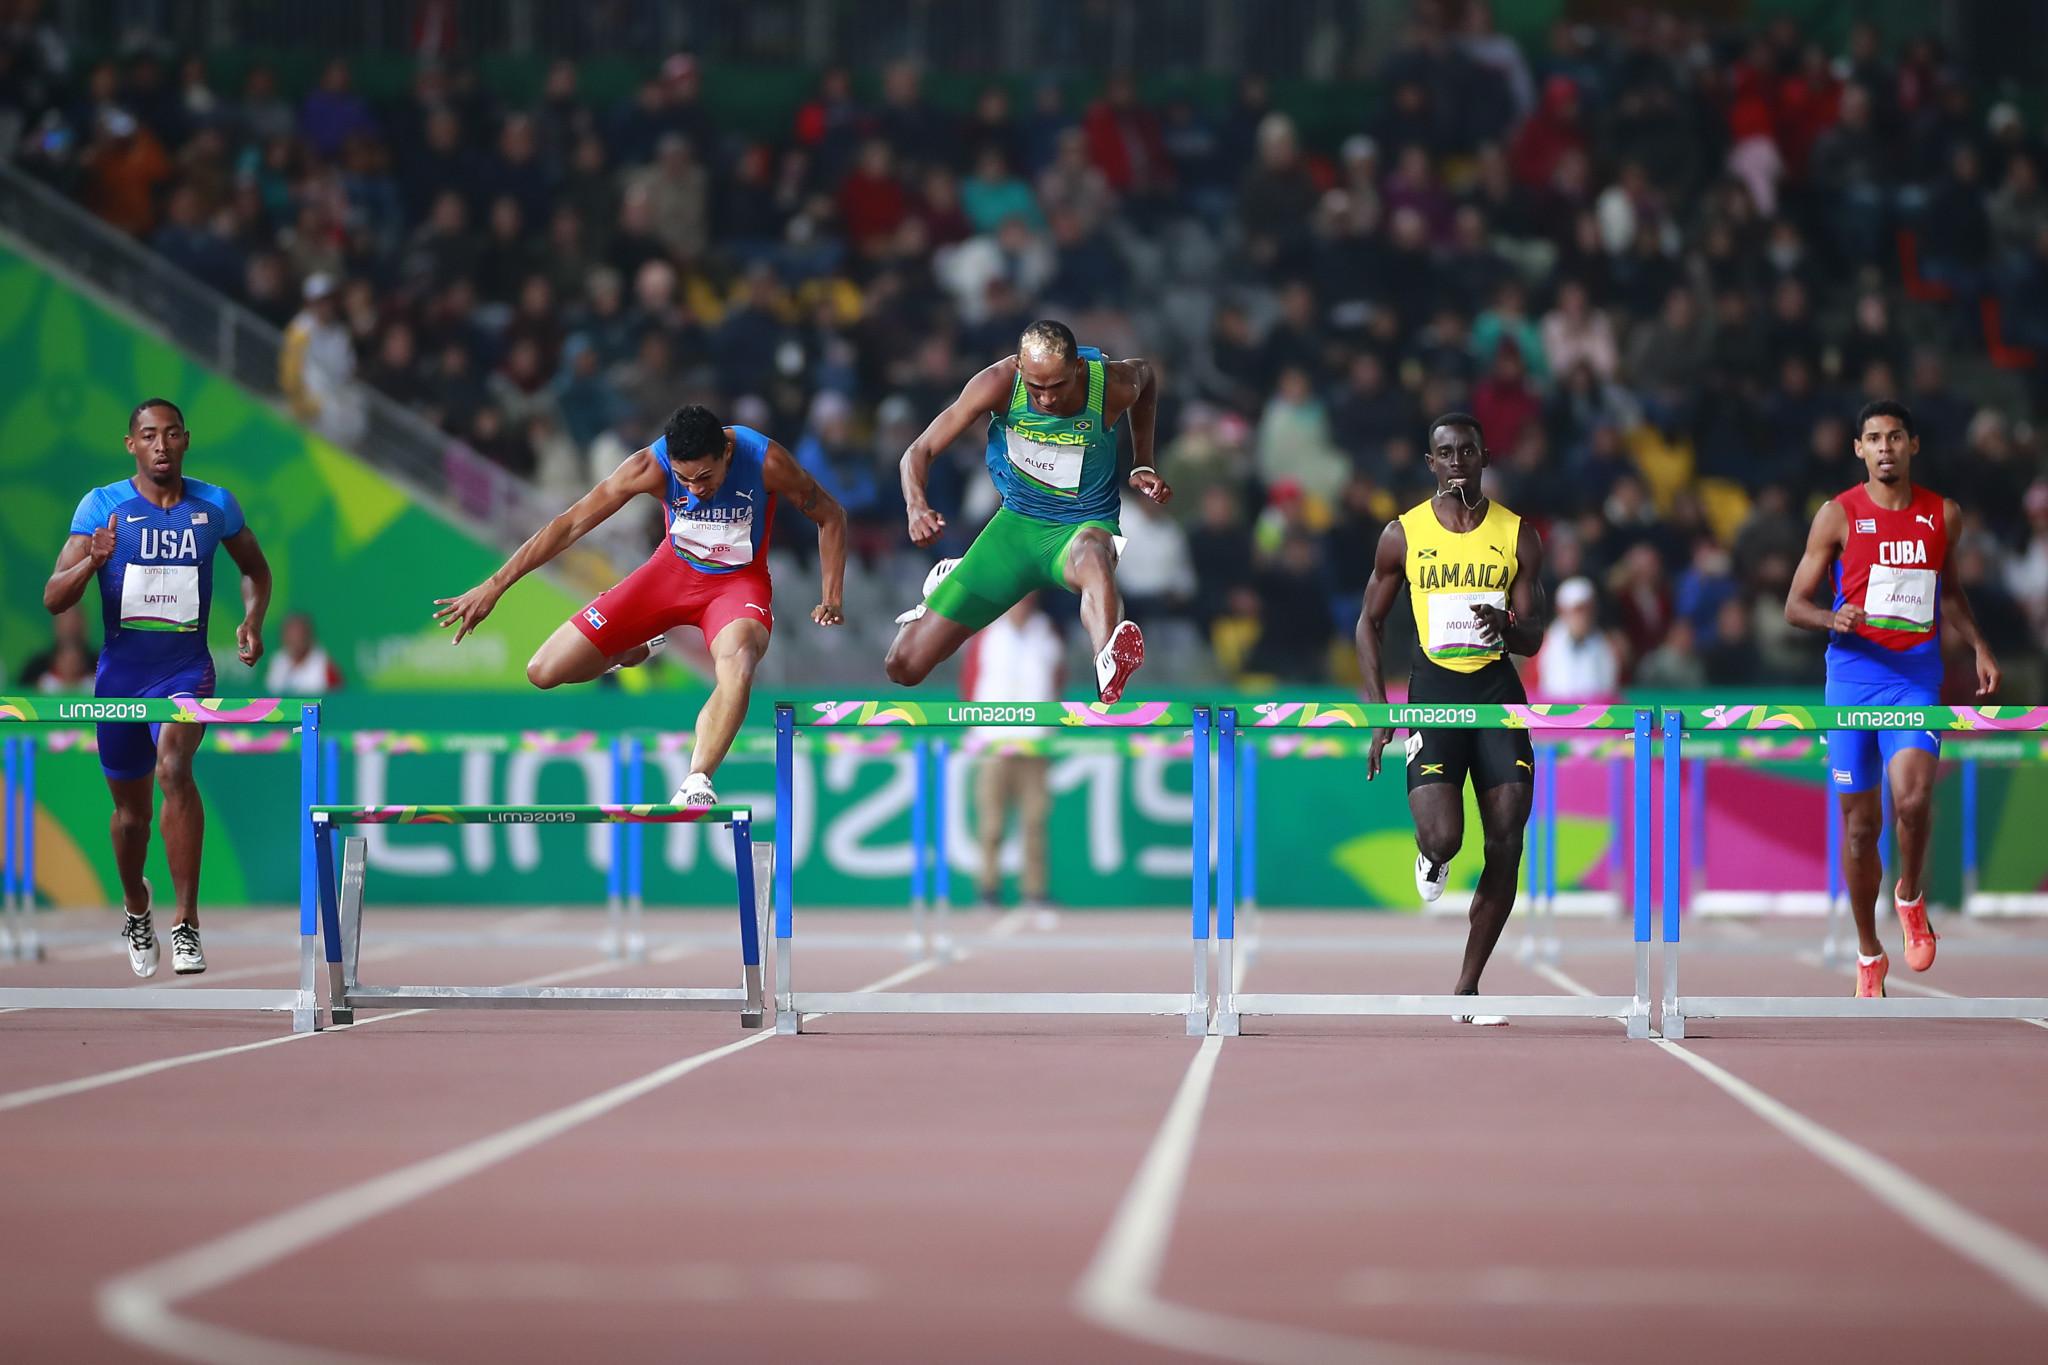 Santos stumbles in hurdles as athletics continues at Lima 2019